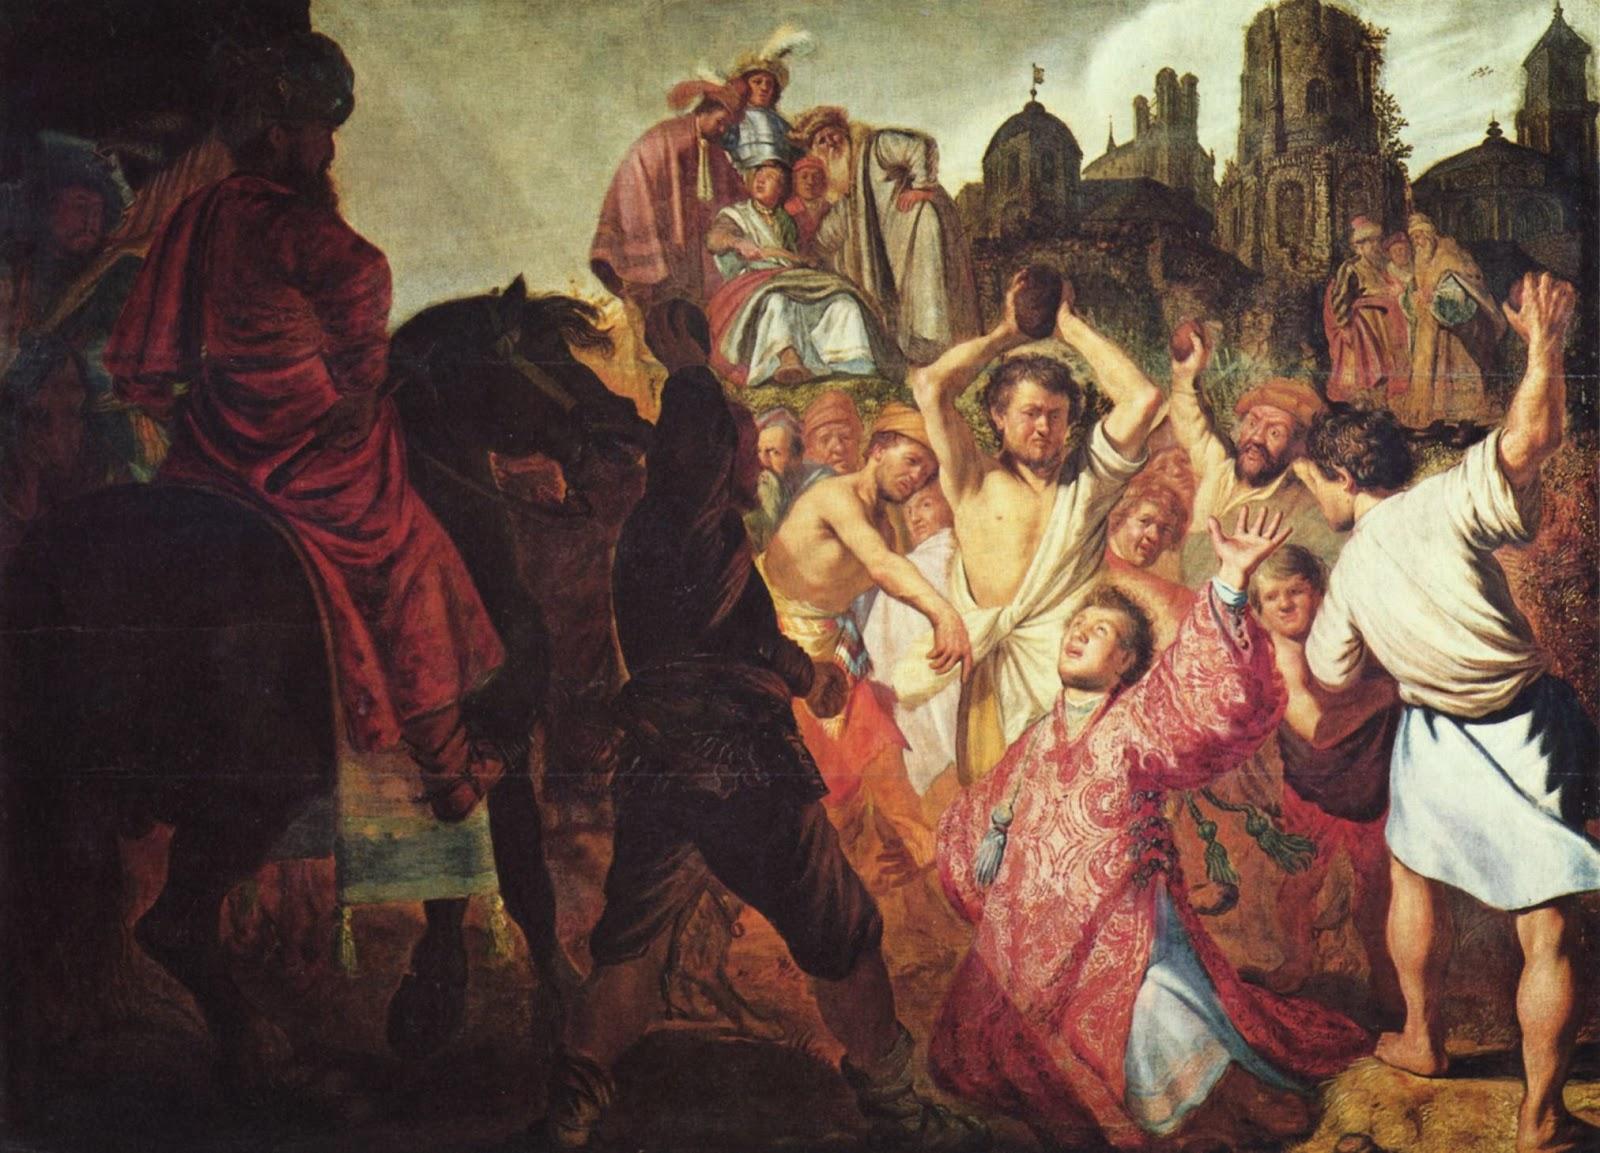 St. Stephen – Martyr